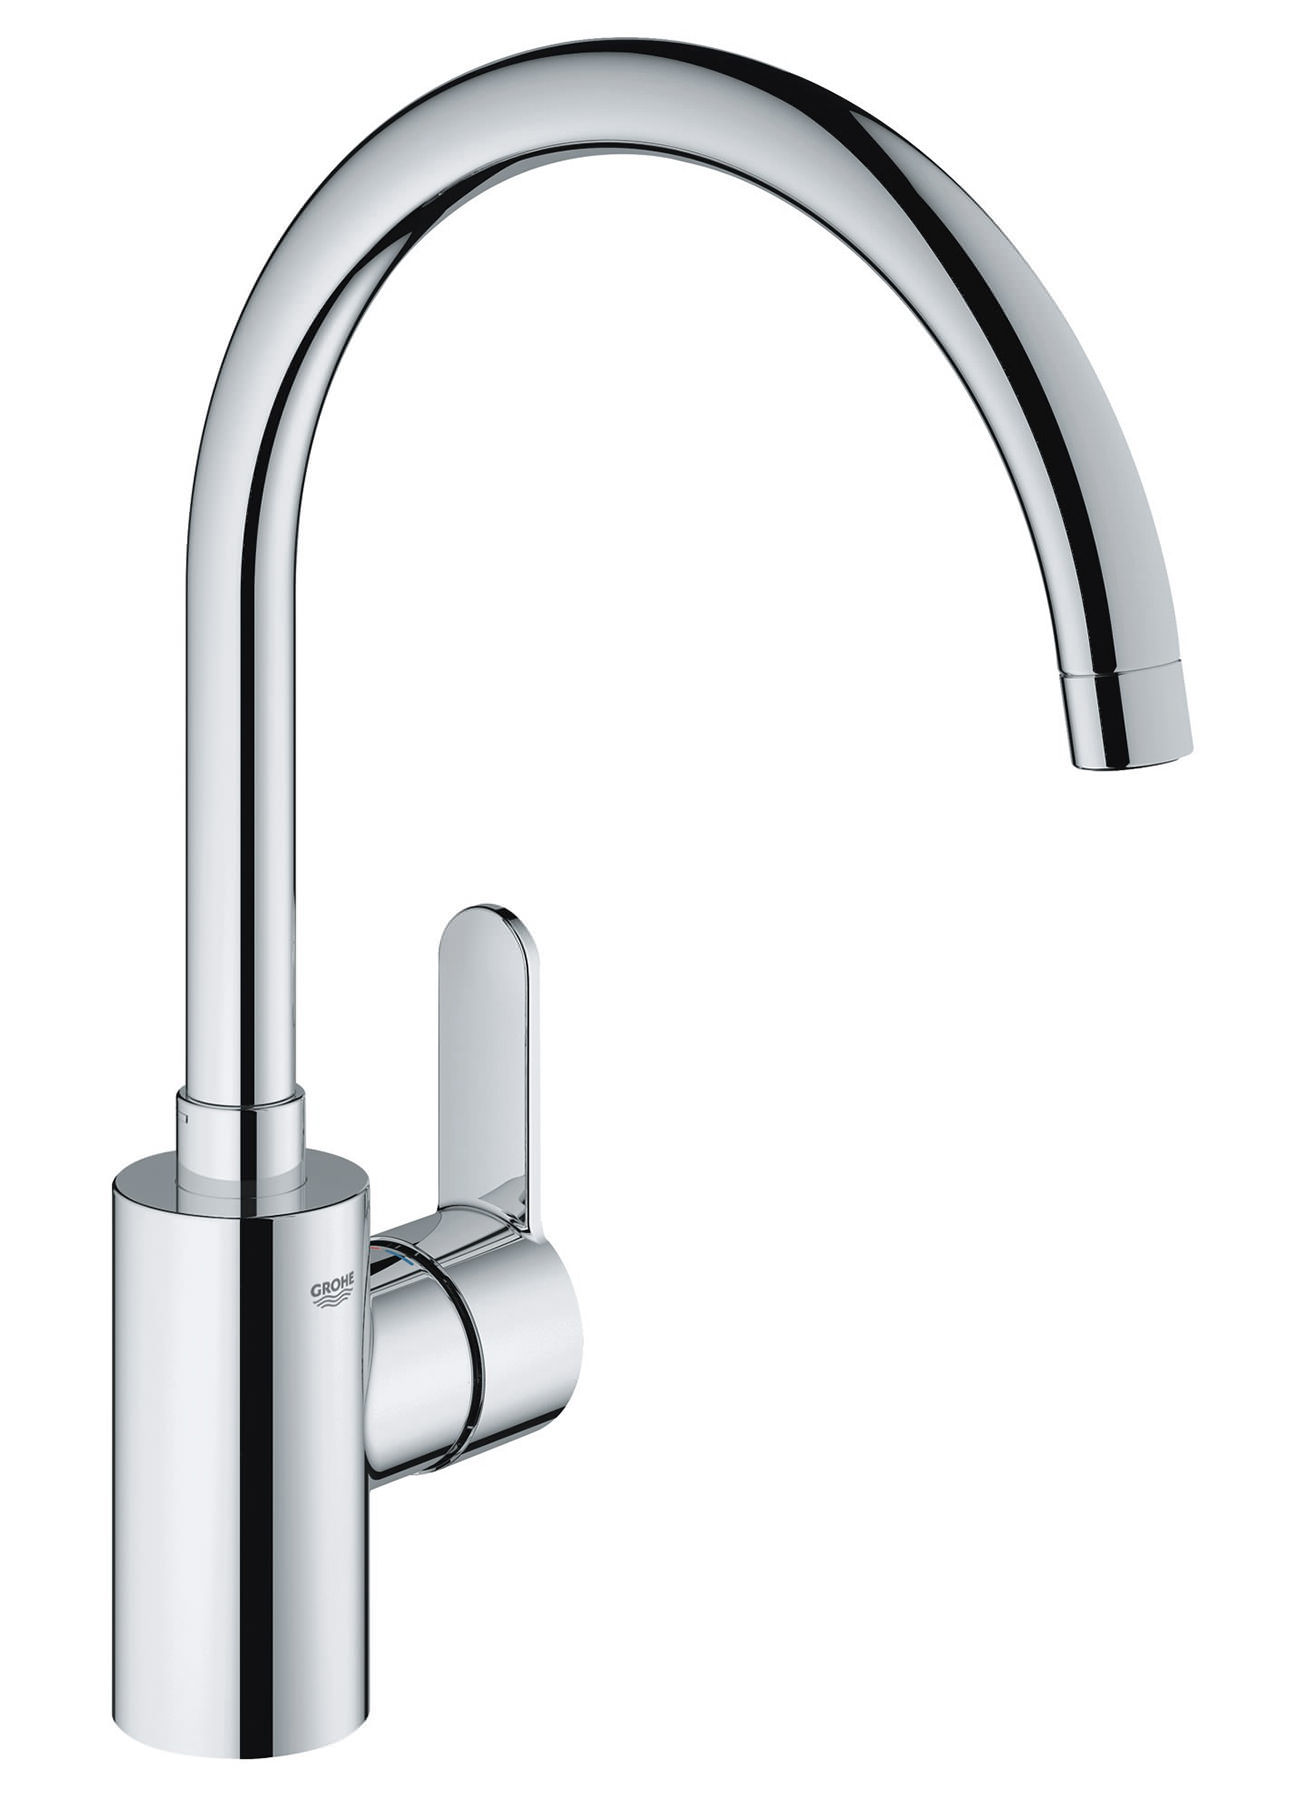 Grohe Eurostyle Cosmopolitan High Spout Mono Sink Mixer Tap